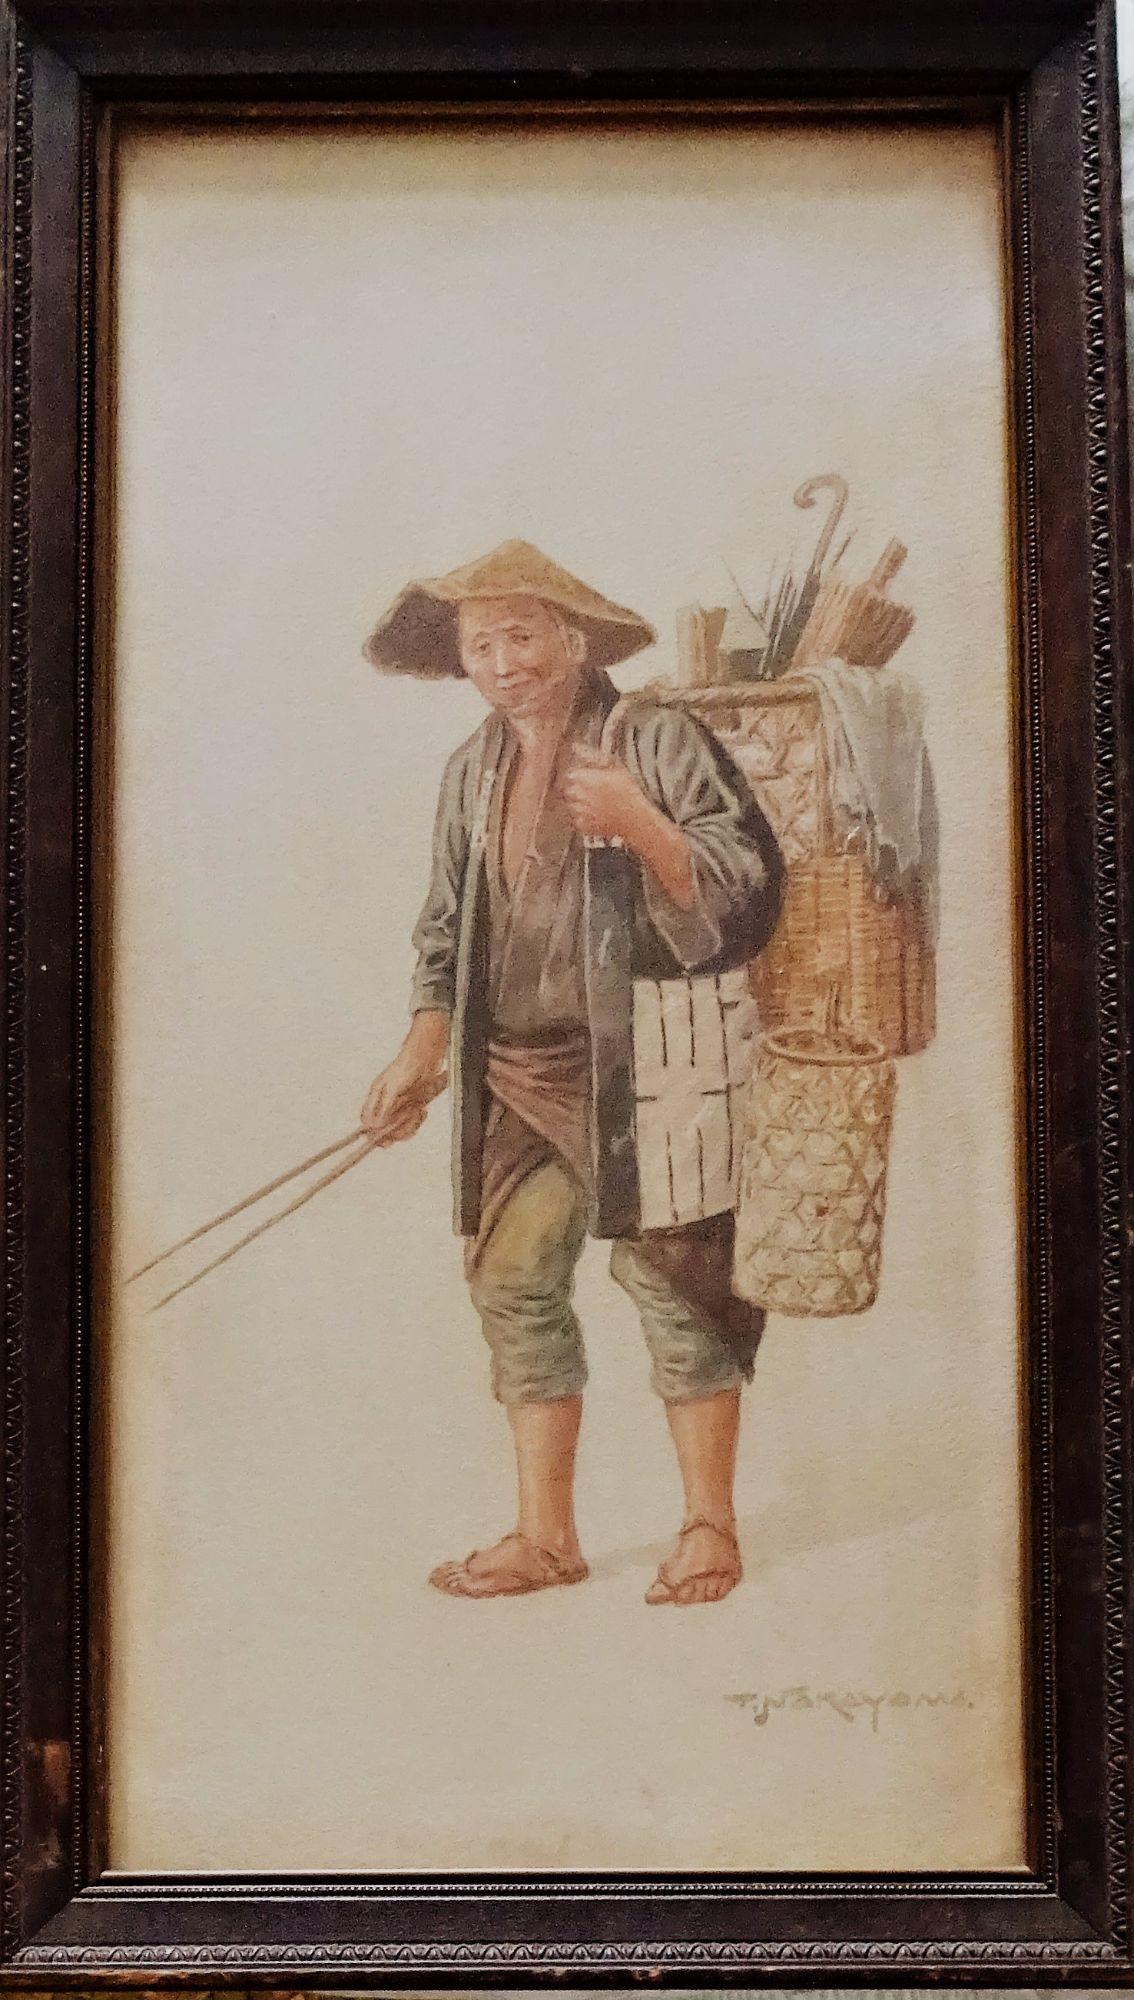 T. Nakayama, Japanese artisan, watercolour, c1930.